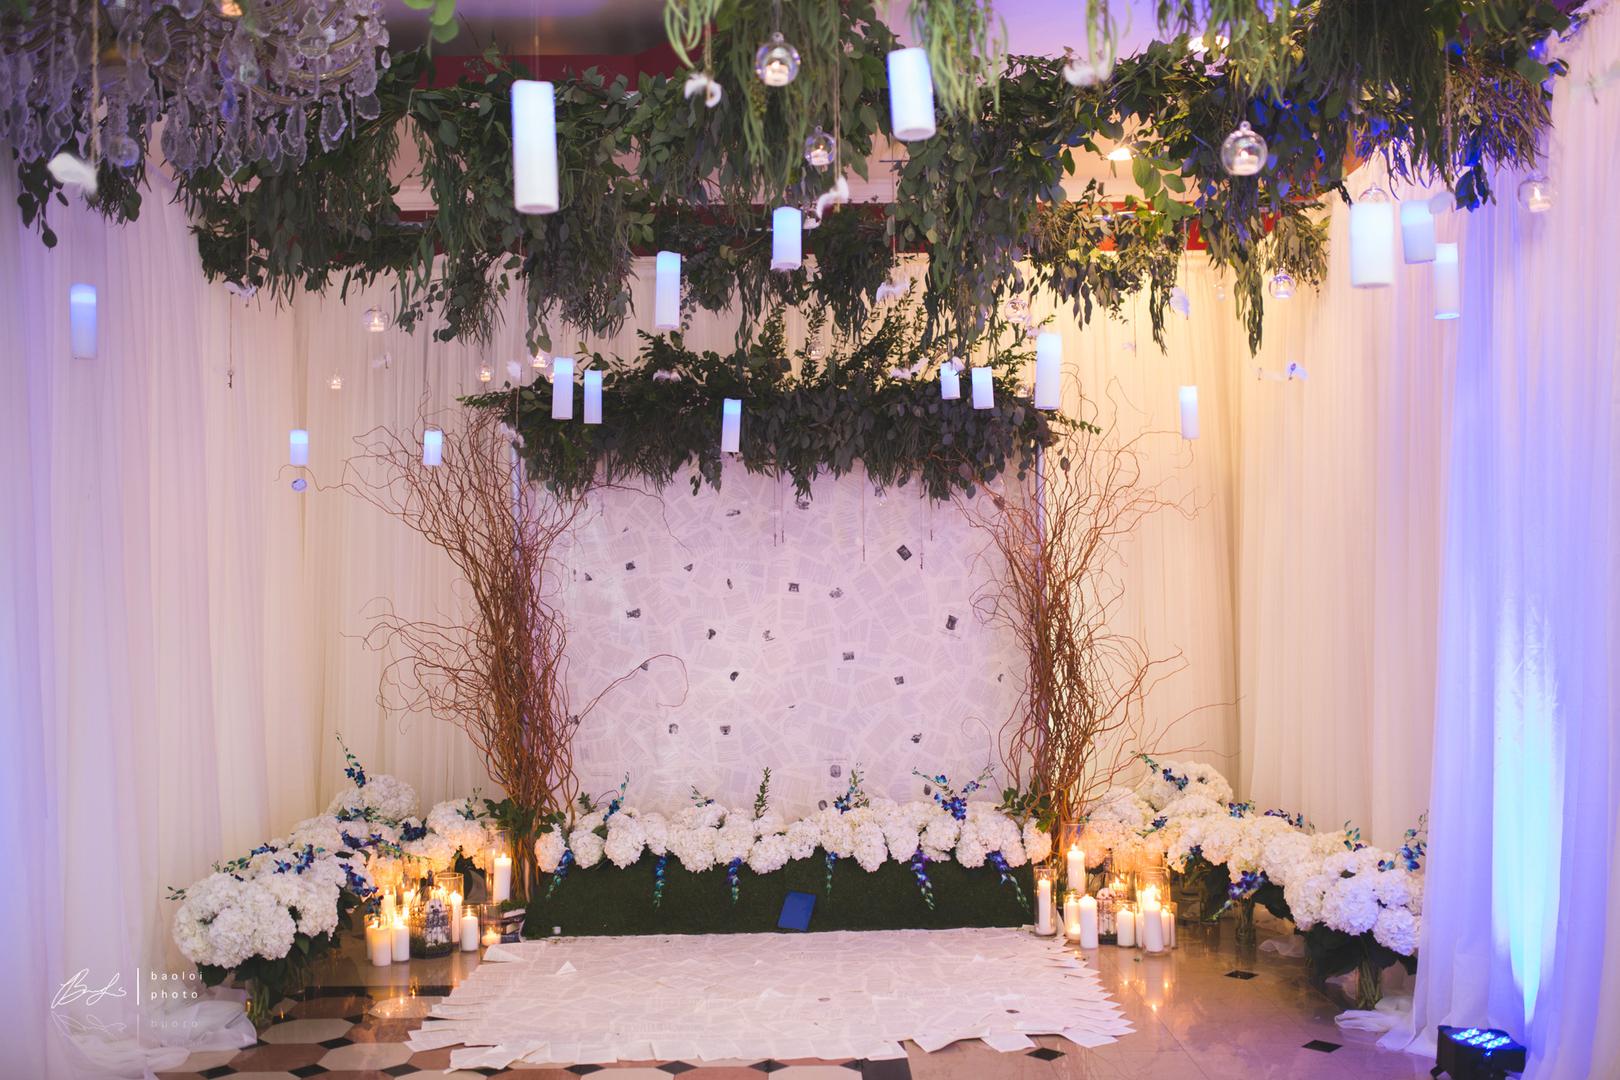 Wedding Decorations Houston | Linen Rental Houston For Event And Wedding Decorations